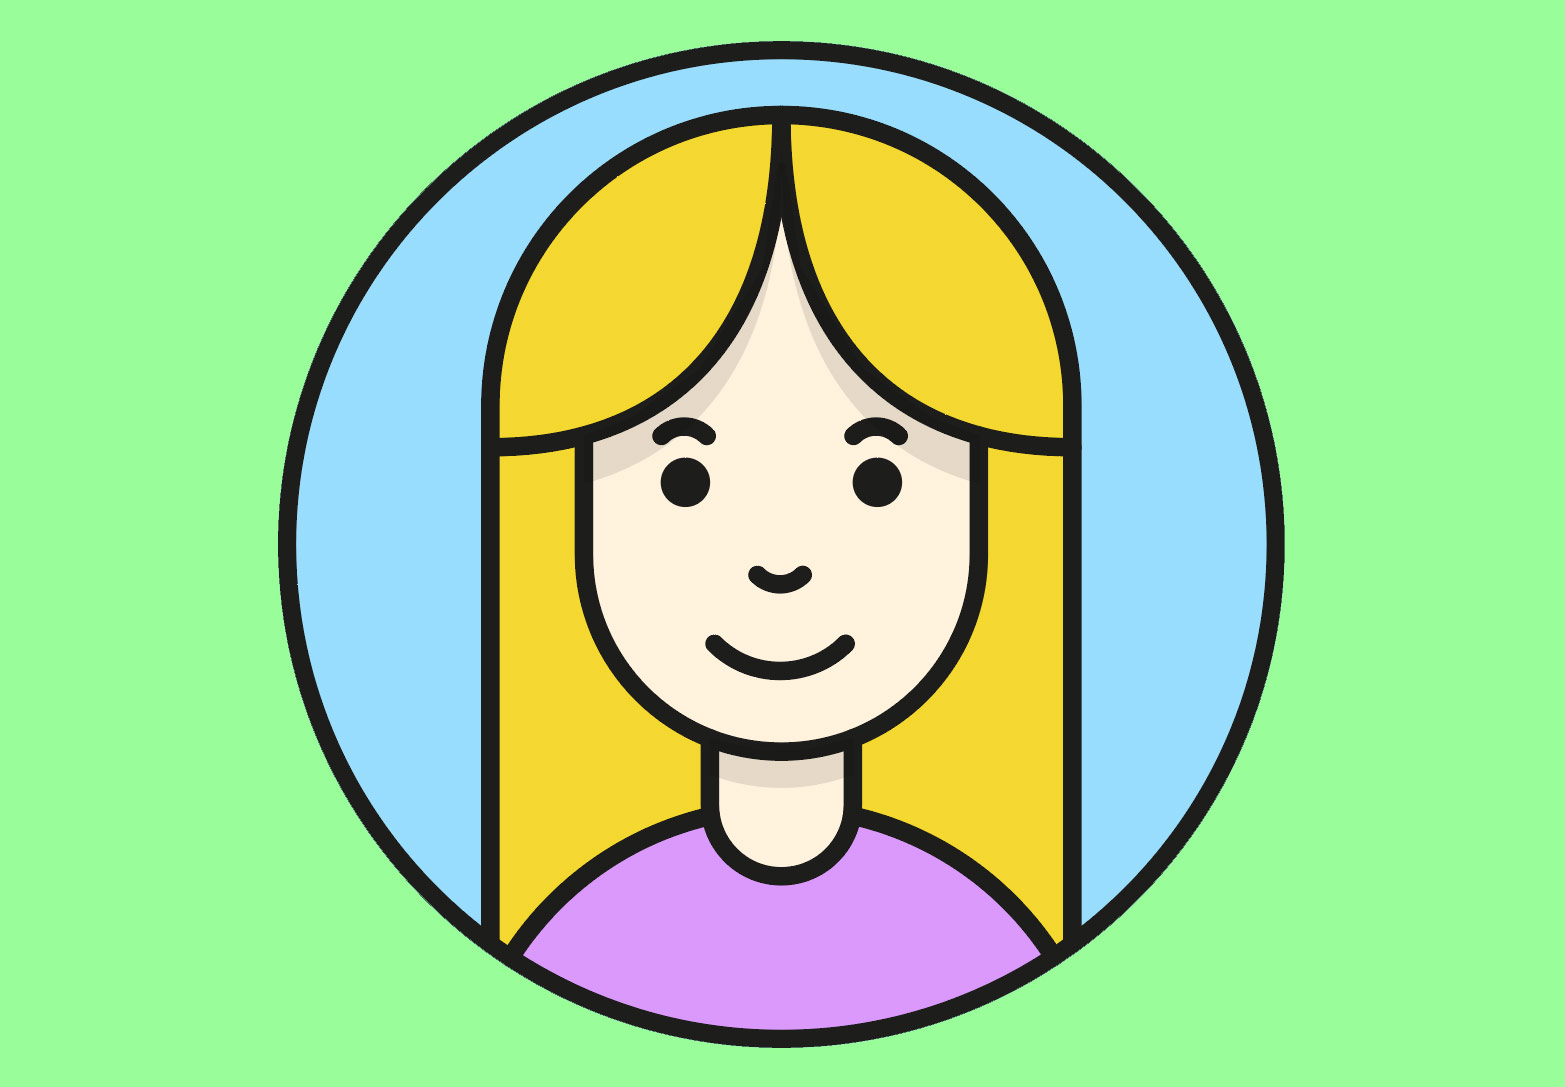 Cartoon of girl's face